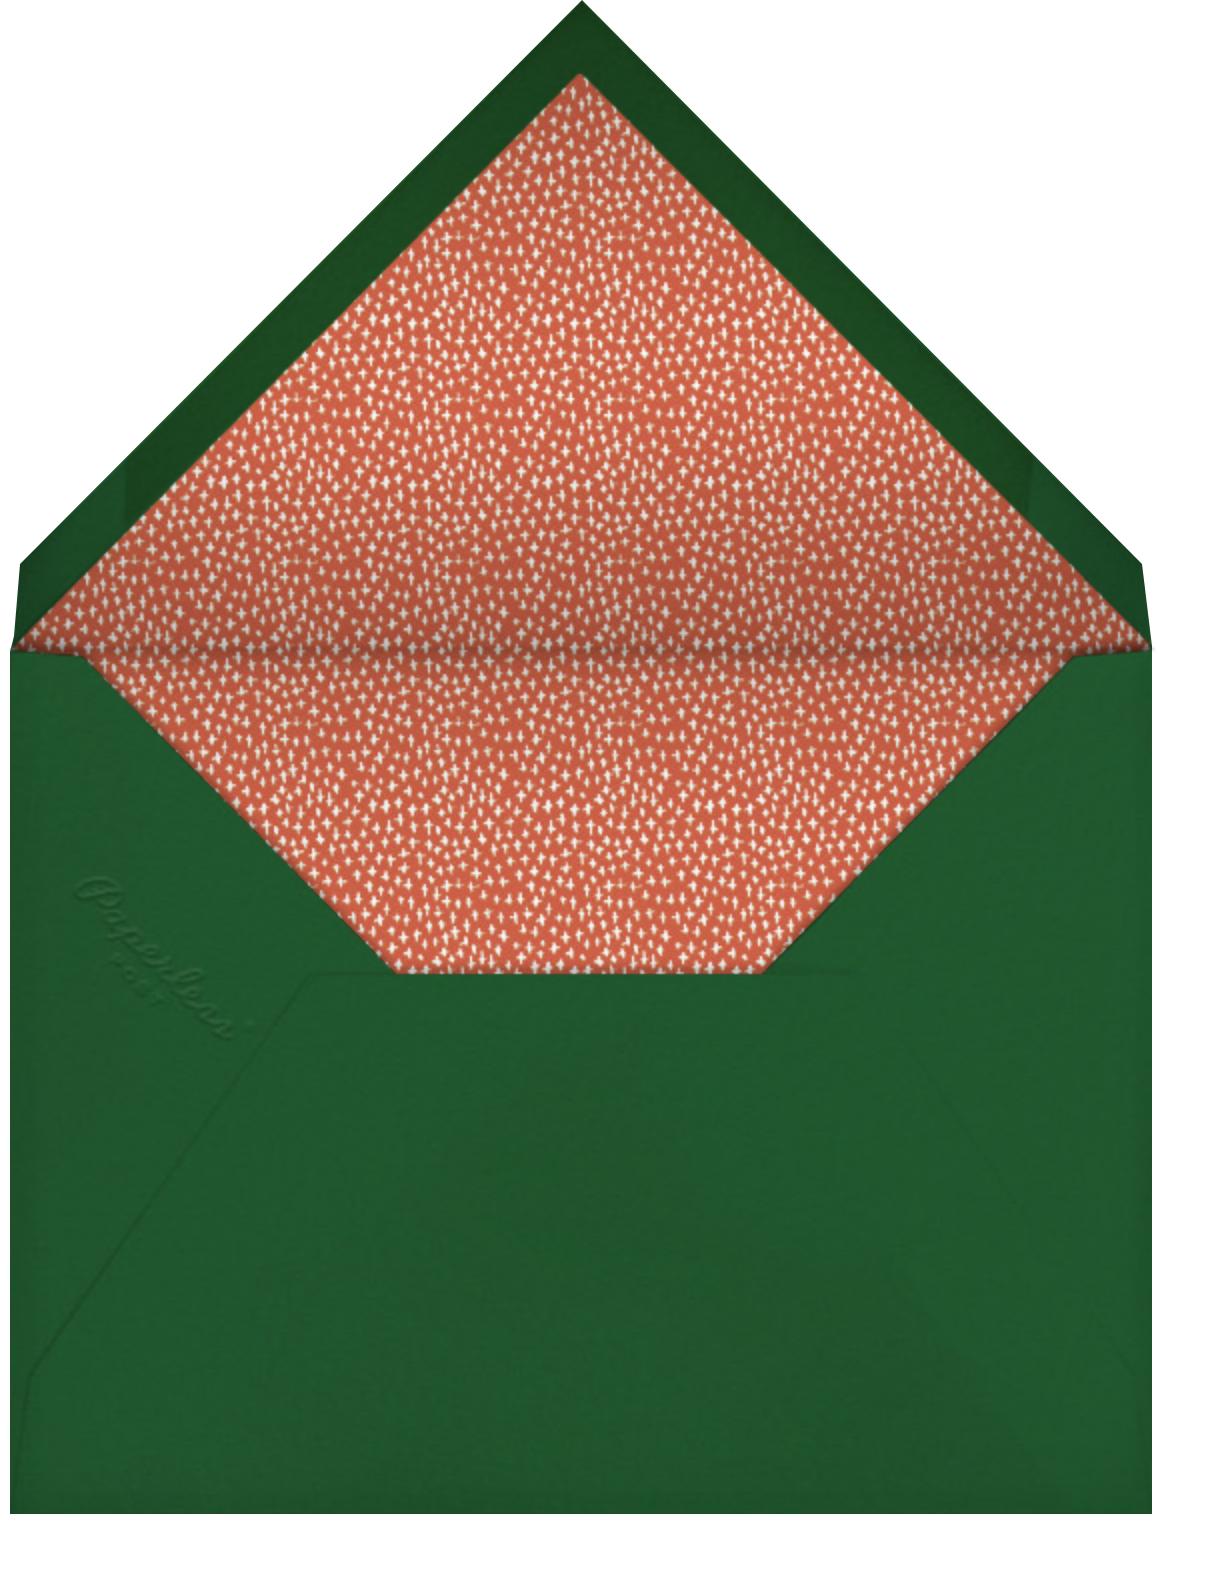 Pint of Strawberries - Mr. Boddington's Studio - Envelope